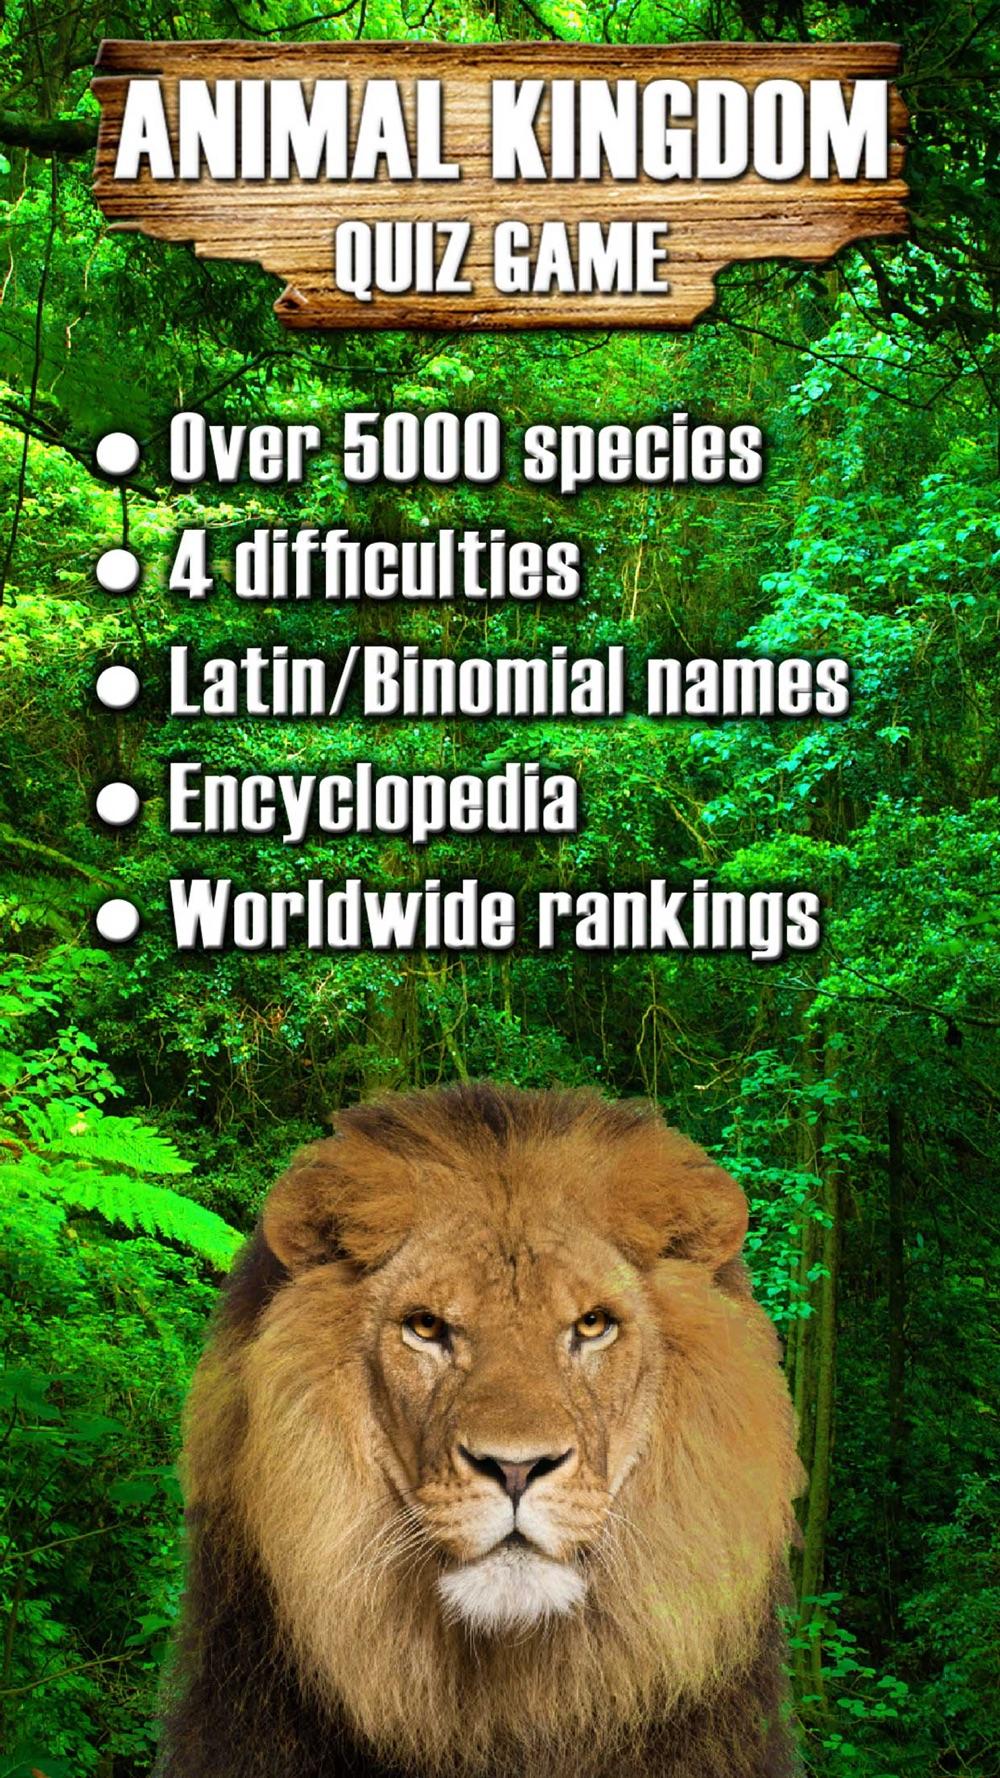 Animal Kingdom – Quiz Game Cheat Codes